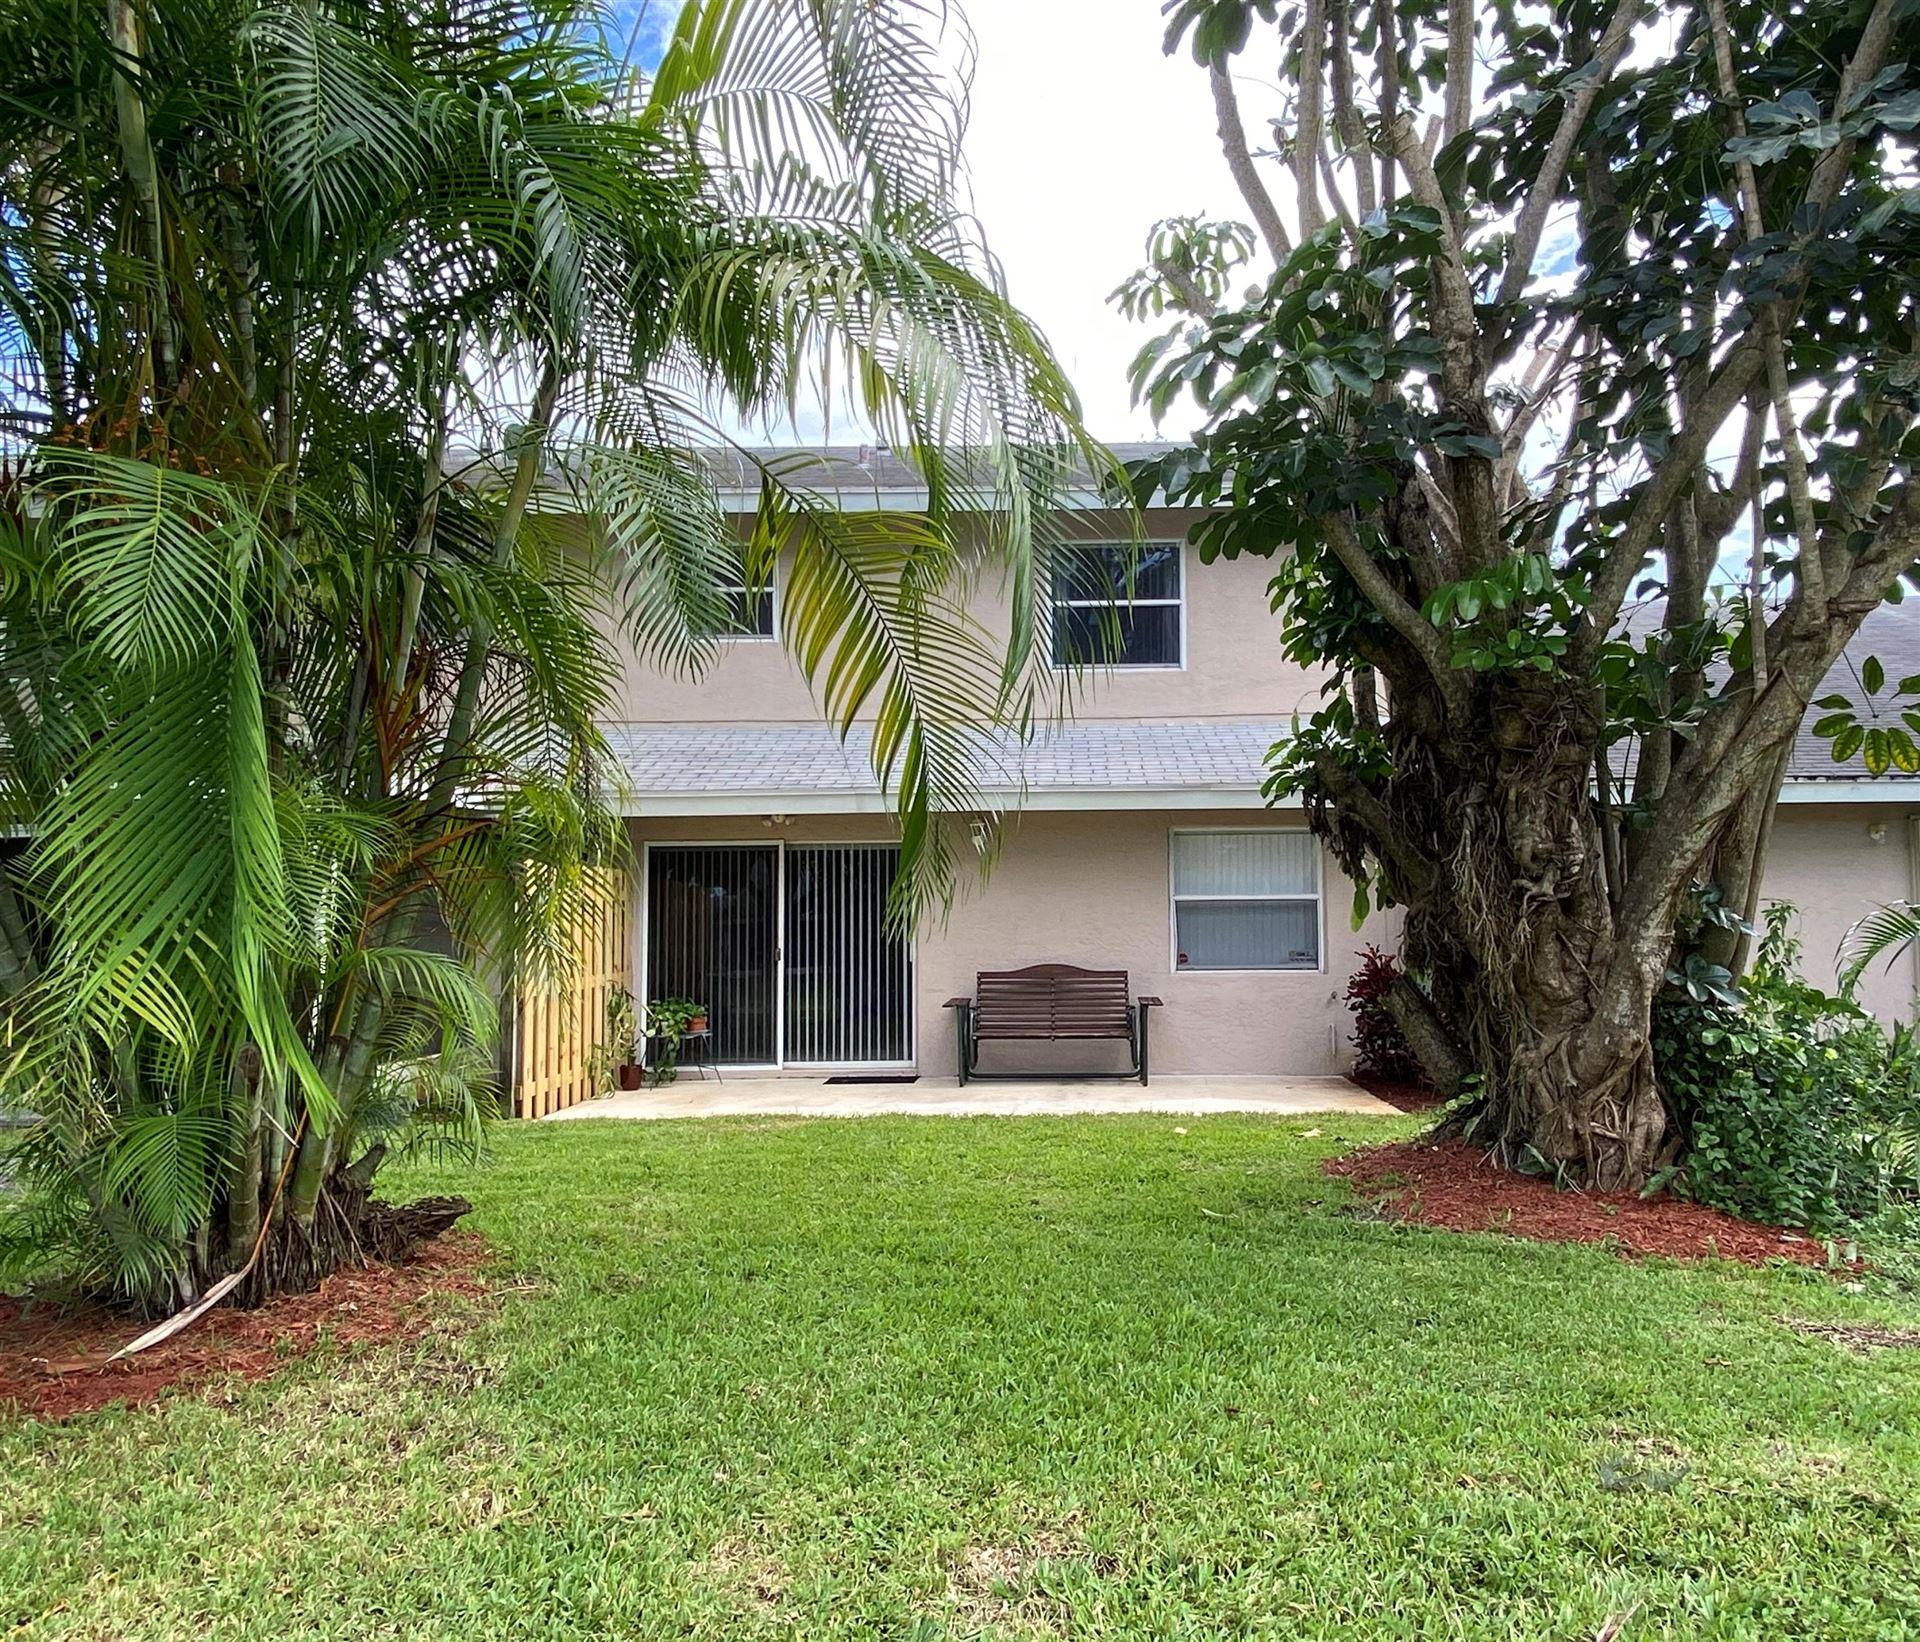 5189 Pine Abbey Drive S, West Palm Beach, FL 33415 - #: RX-10653958